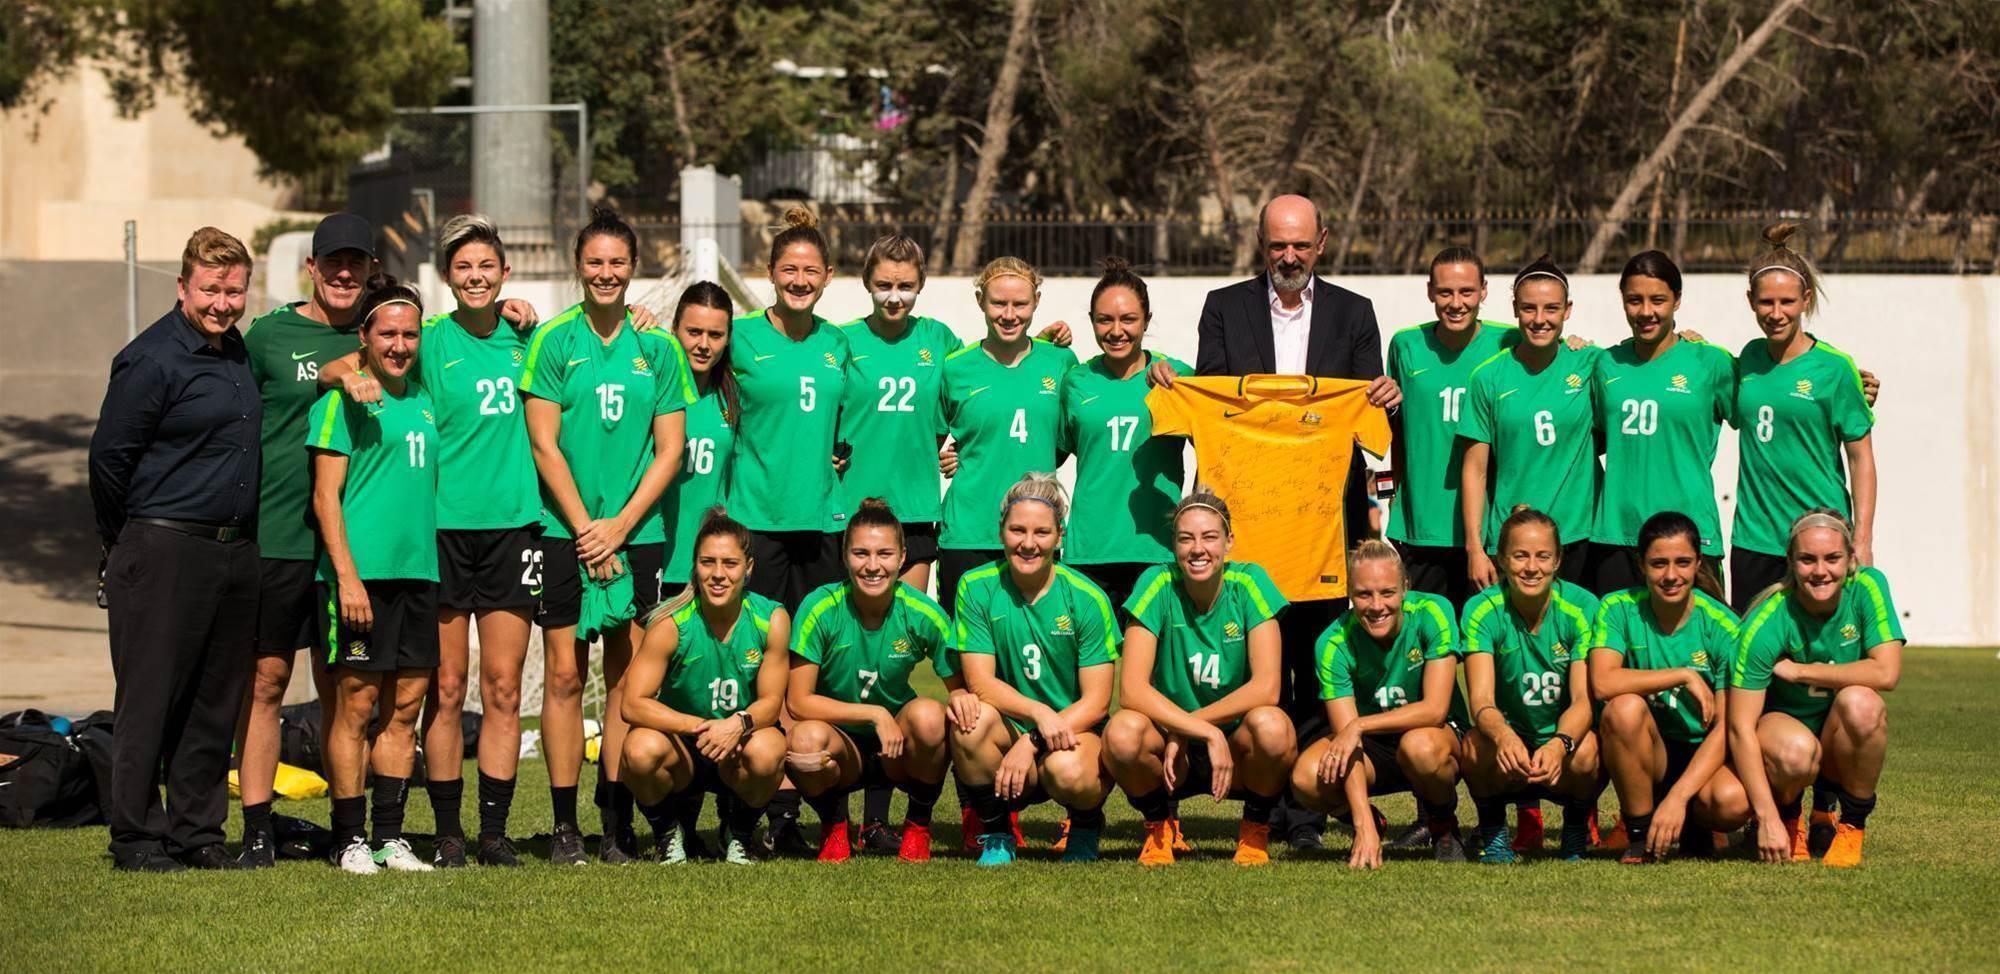 Gallery: Matildas Asian Cup final training pics